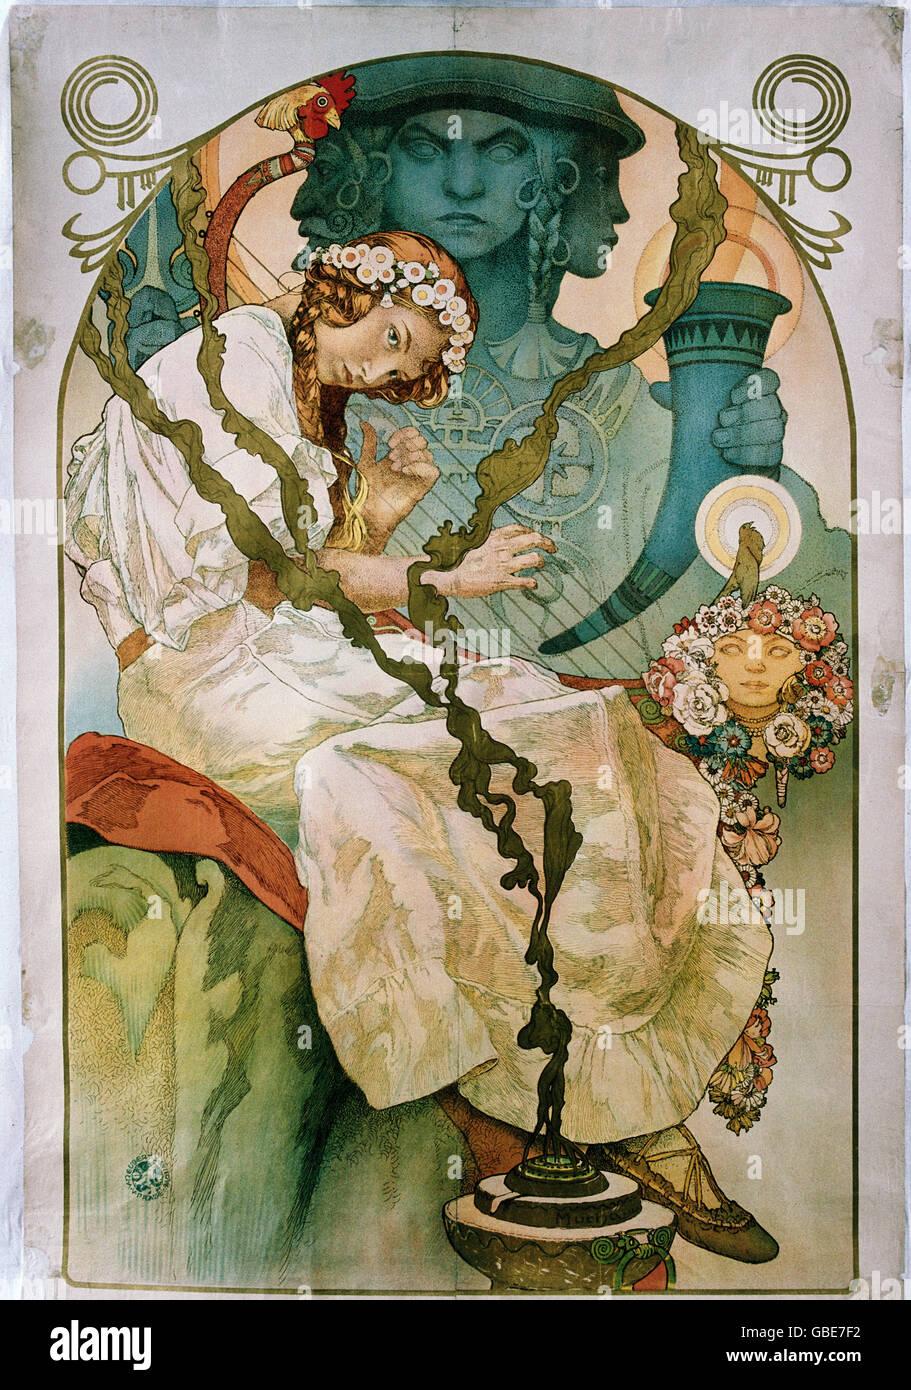 fine arts, Mucha, Alfons, Alfons (1860 - 1939), poster, colour lithograph, circa 1900, Stock Photo